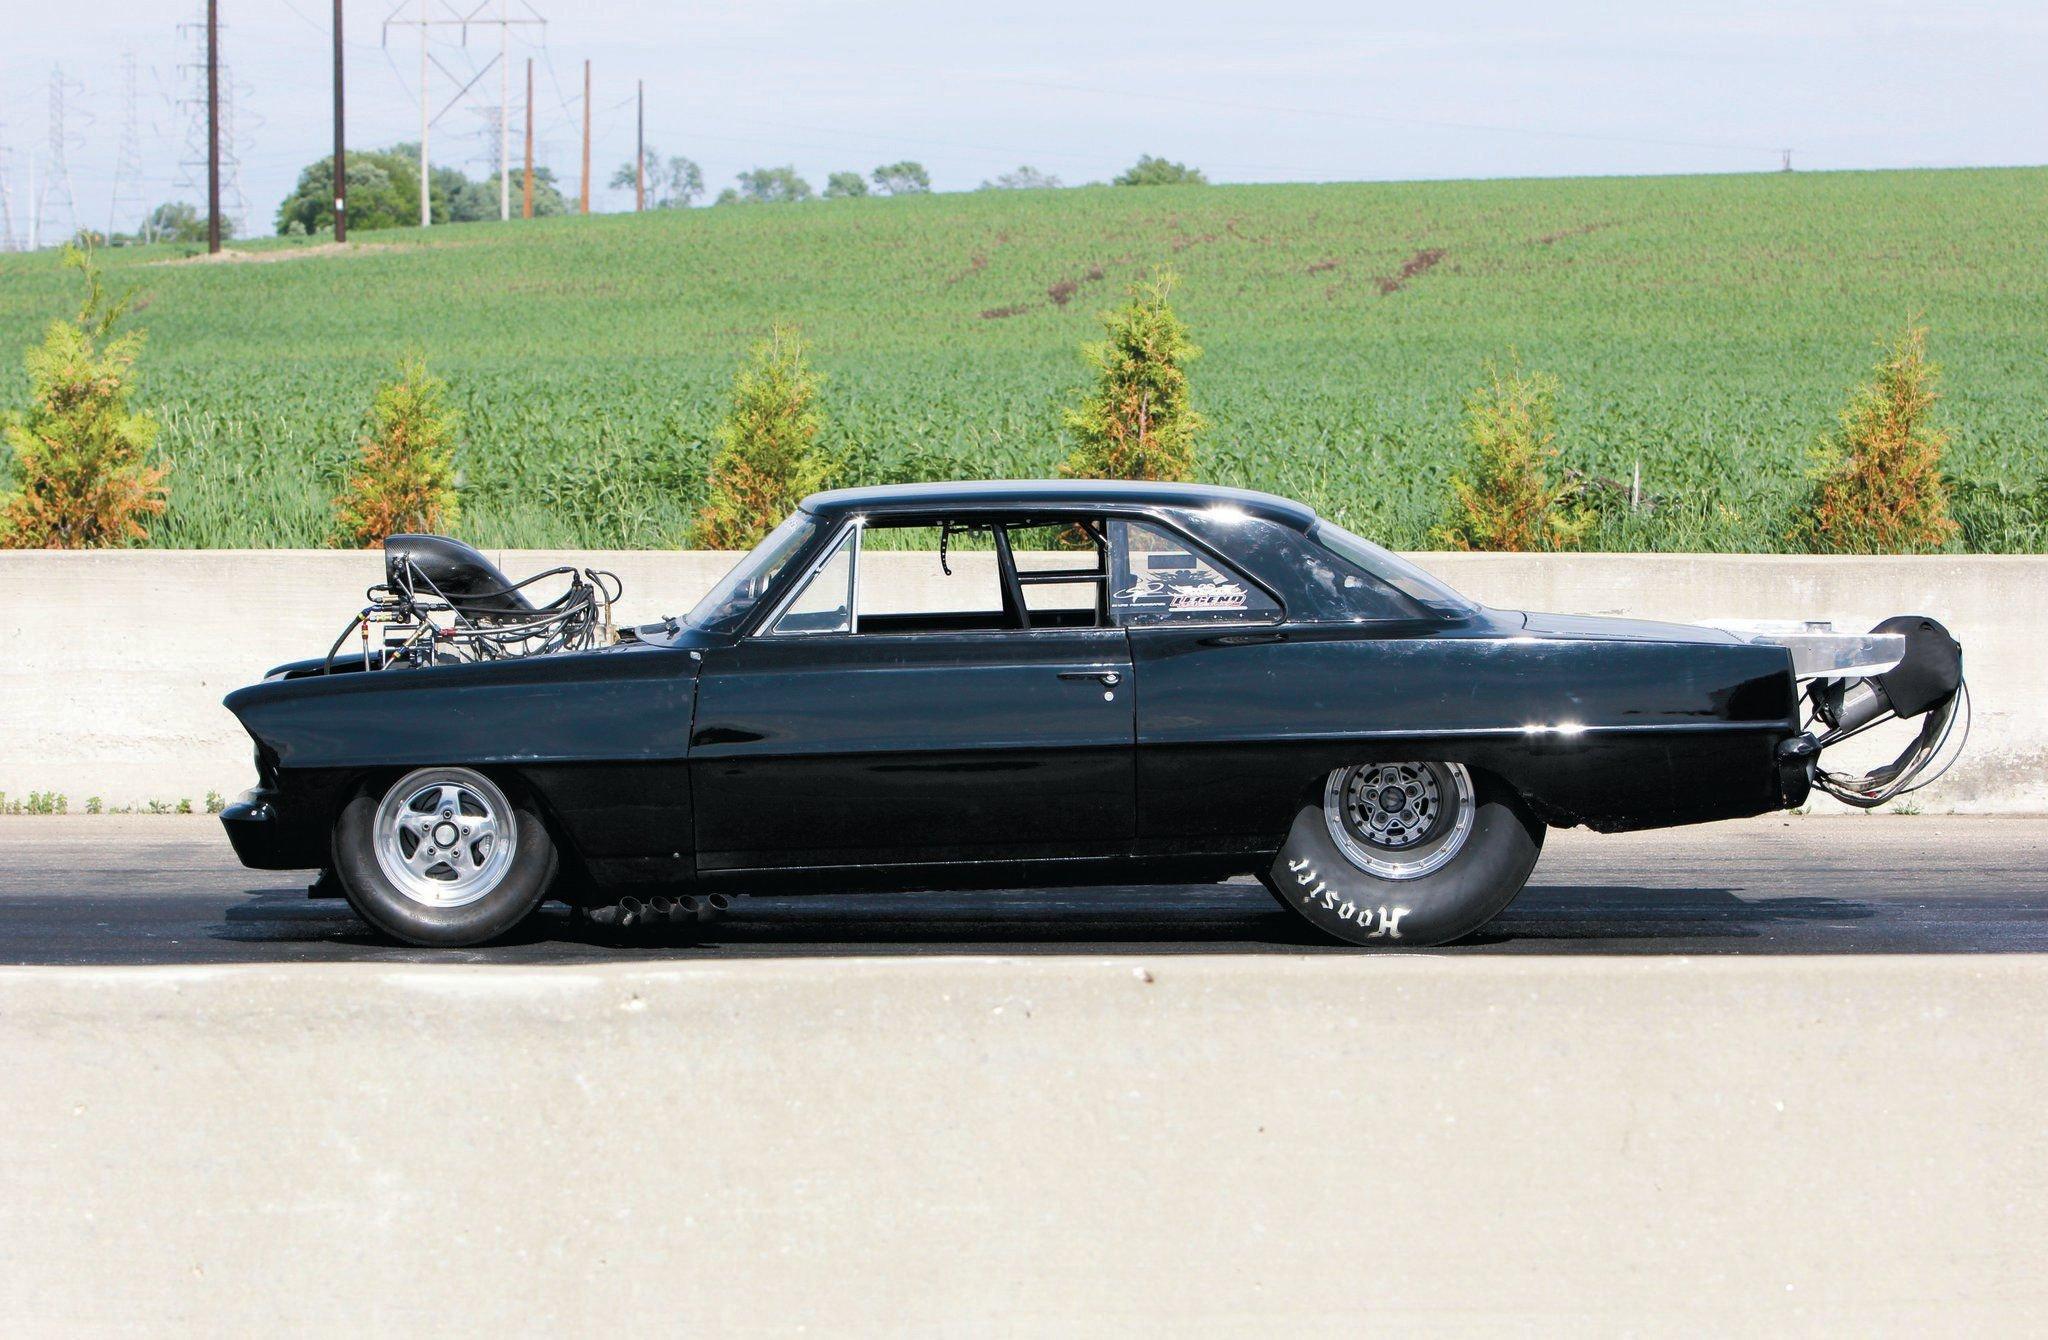 1966 Chevrolet Nova Pro Street-01 wallpaper